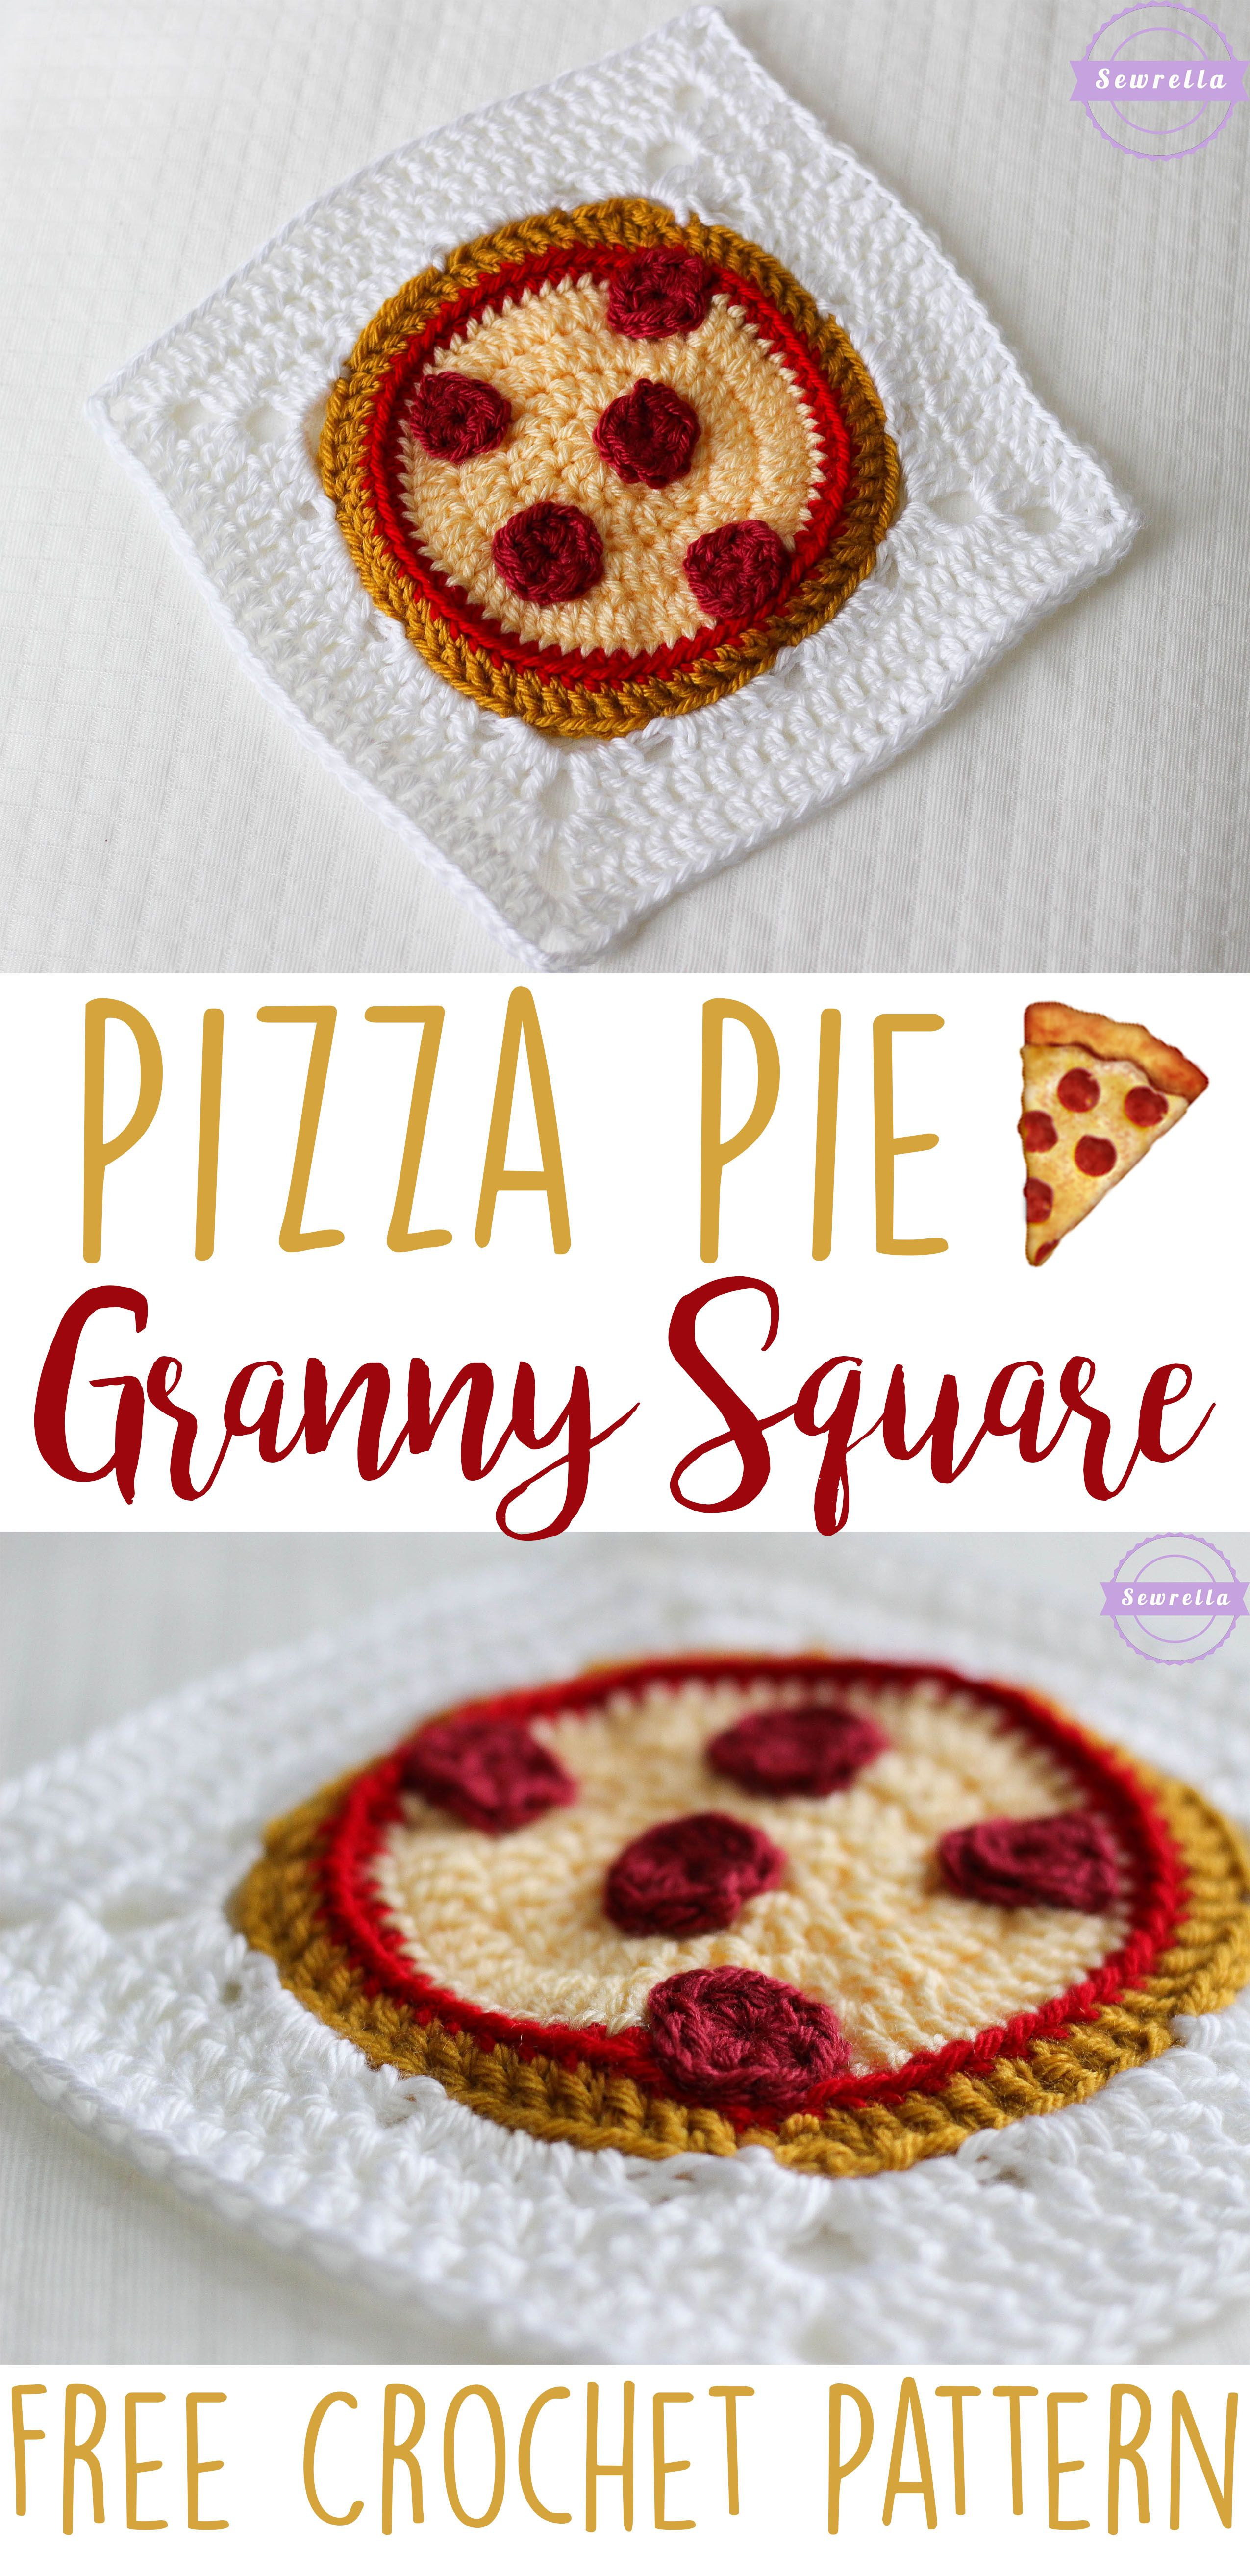 Pizza Pie Crochet Granny Square | Crochet patterns | Pinterest ...